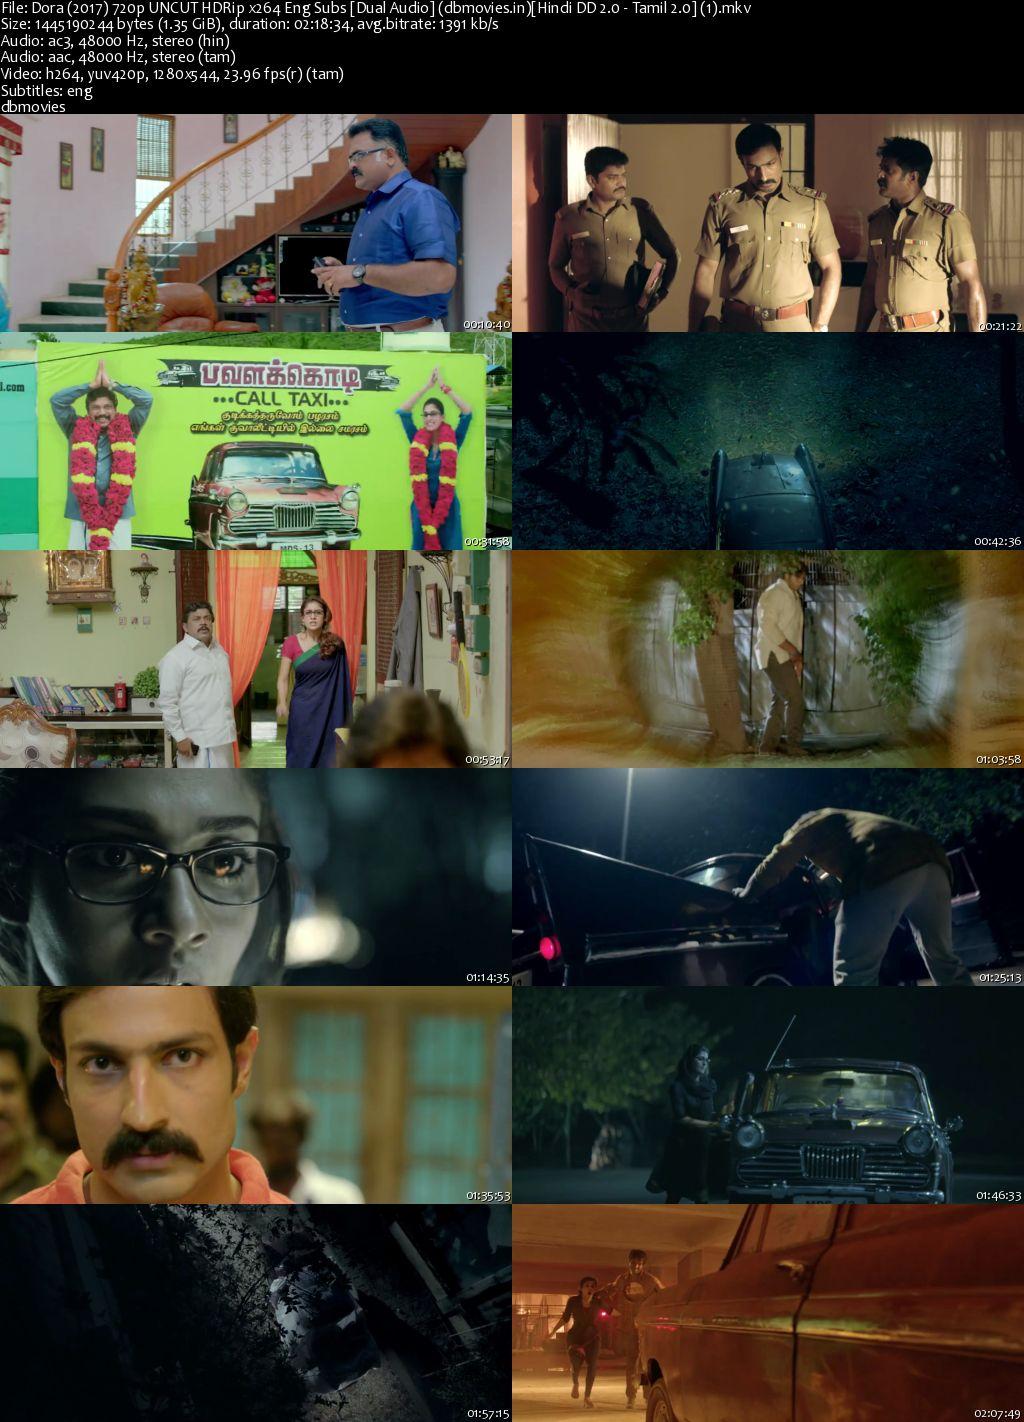 screen shot Dora 2017 Full Movie Download Dual Audio Hindi 720p